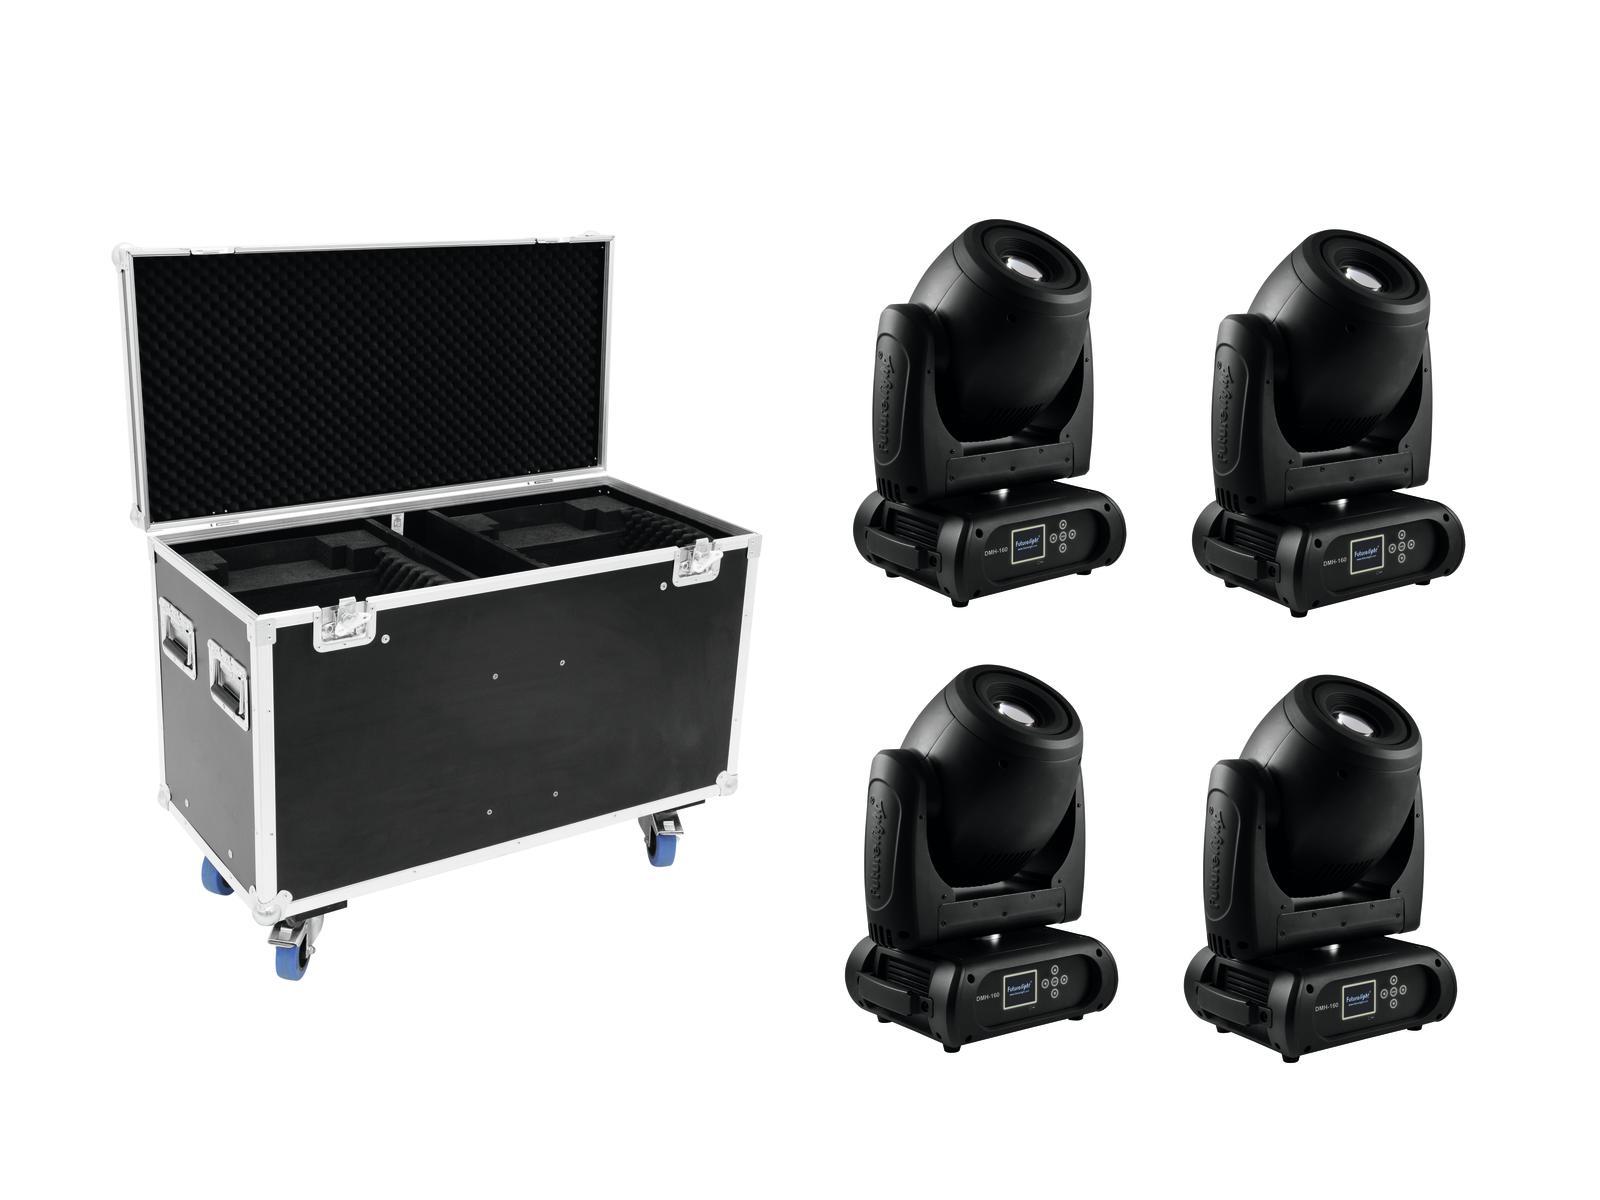 FUTURELIGHT Set 4x DMH-160 LED Moving-Head + Caso